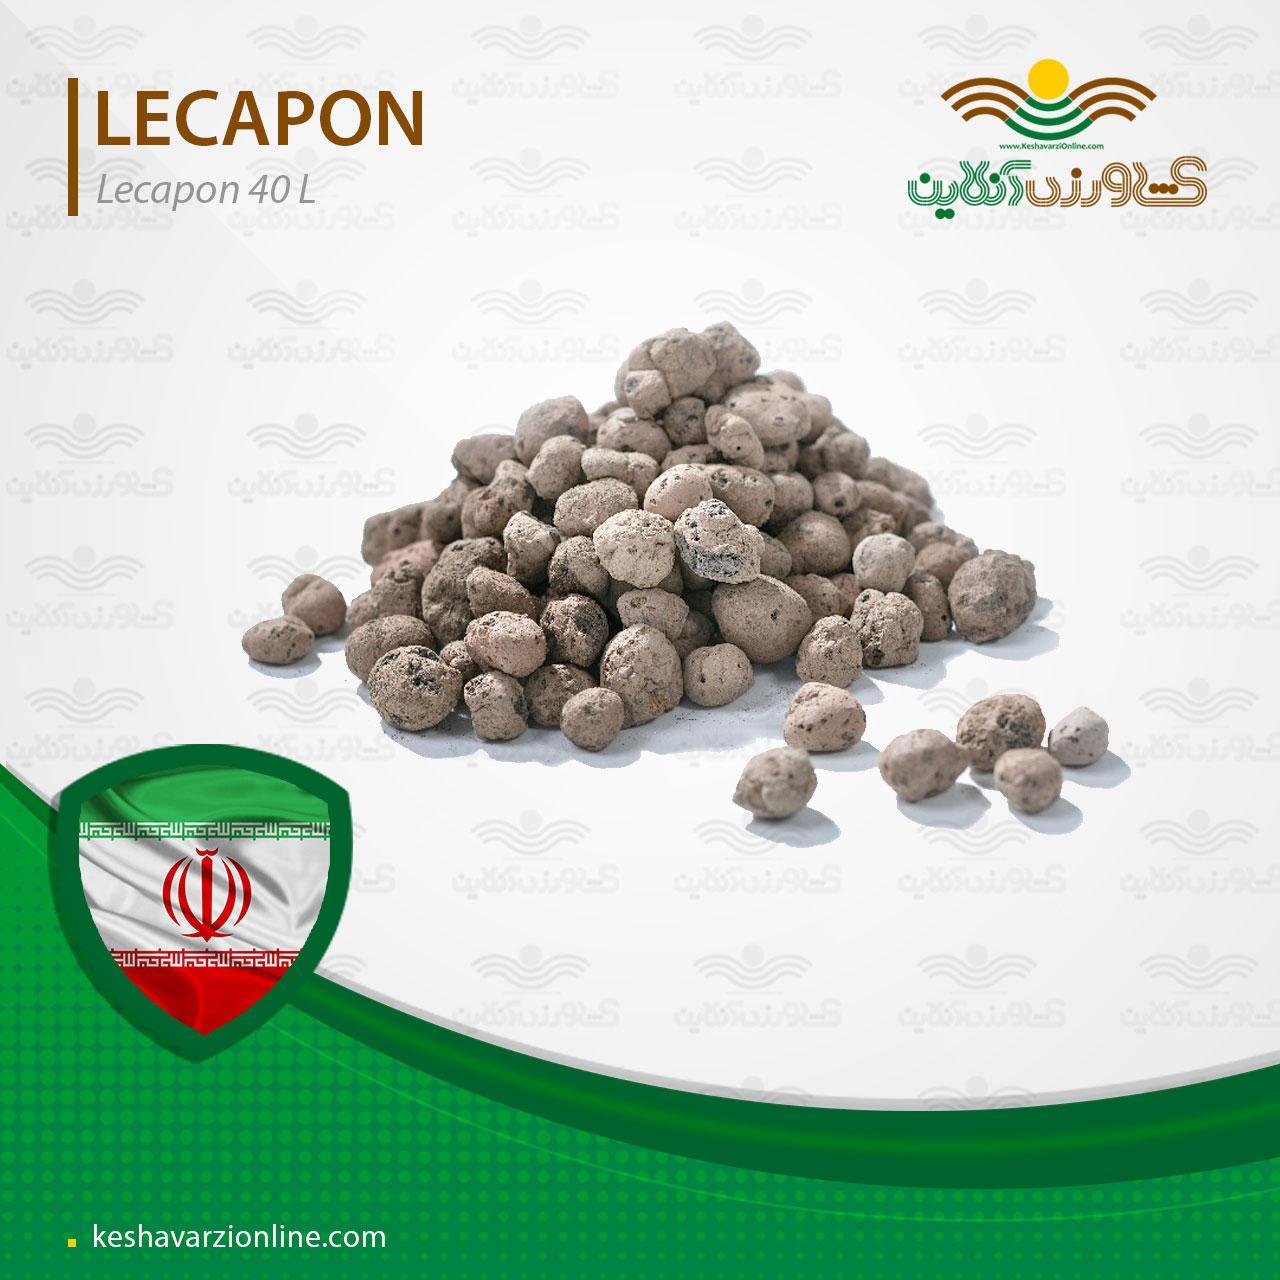 لیکا و کاربرد لیکاپون در هیدروپونیک و کشاورزی